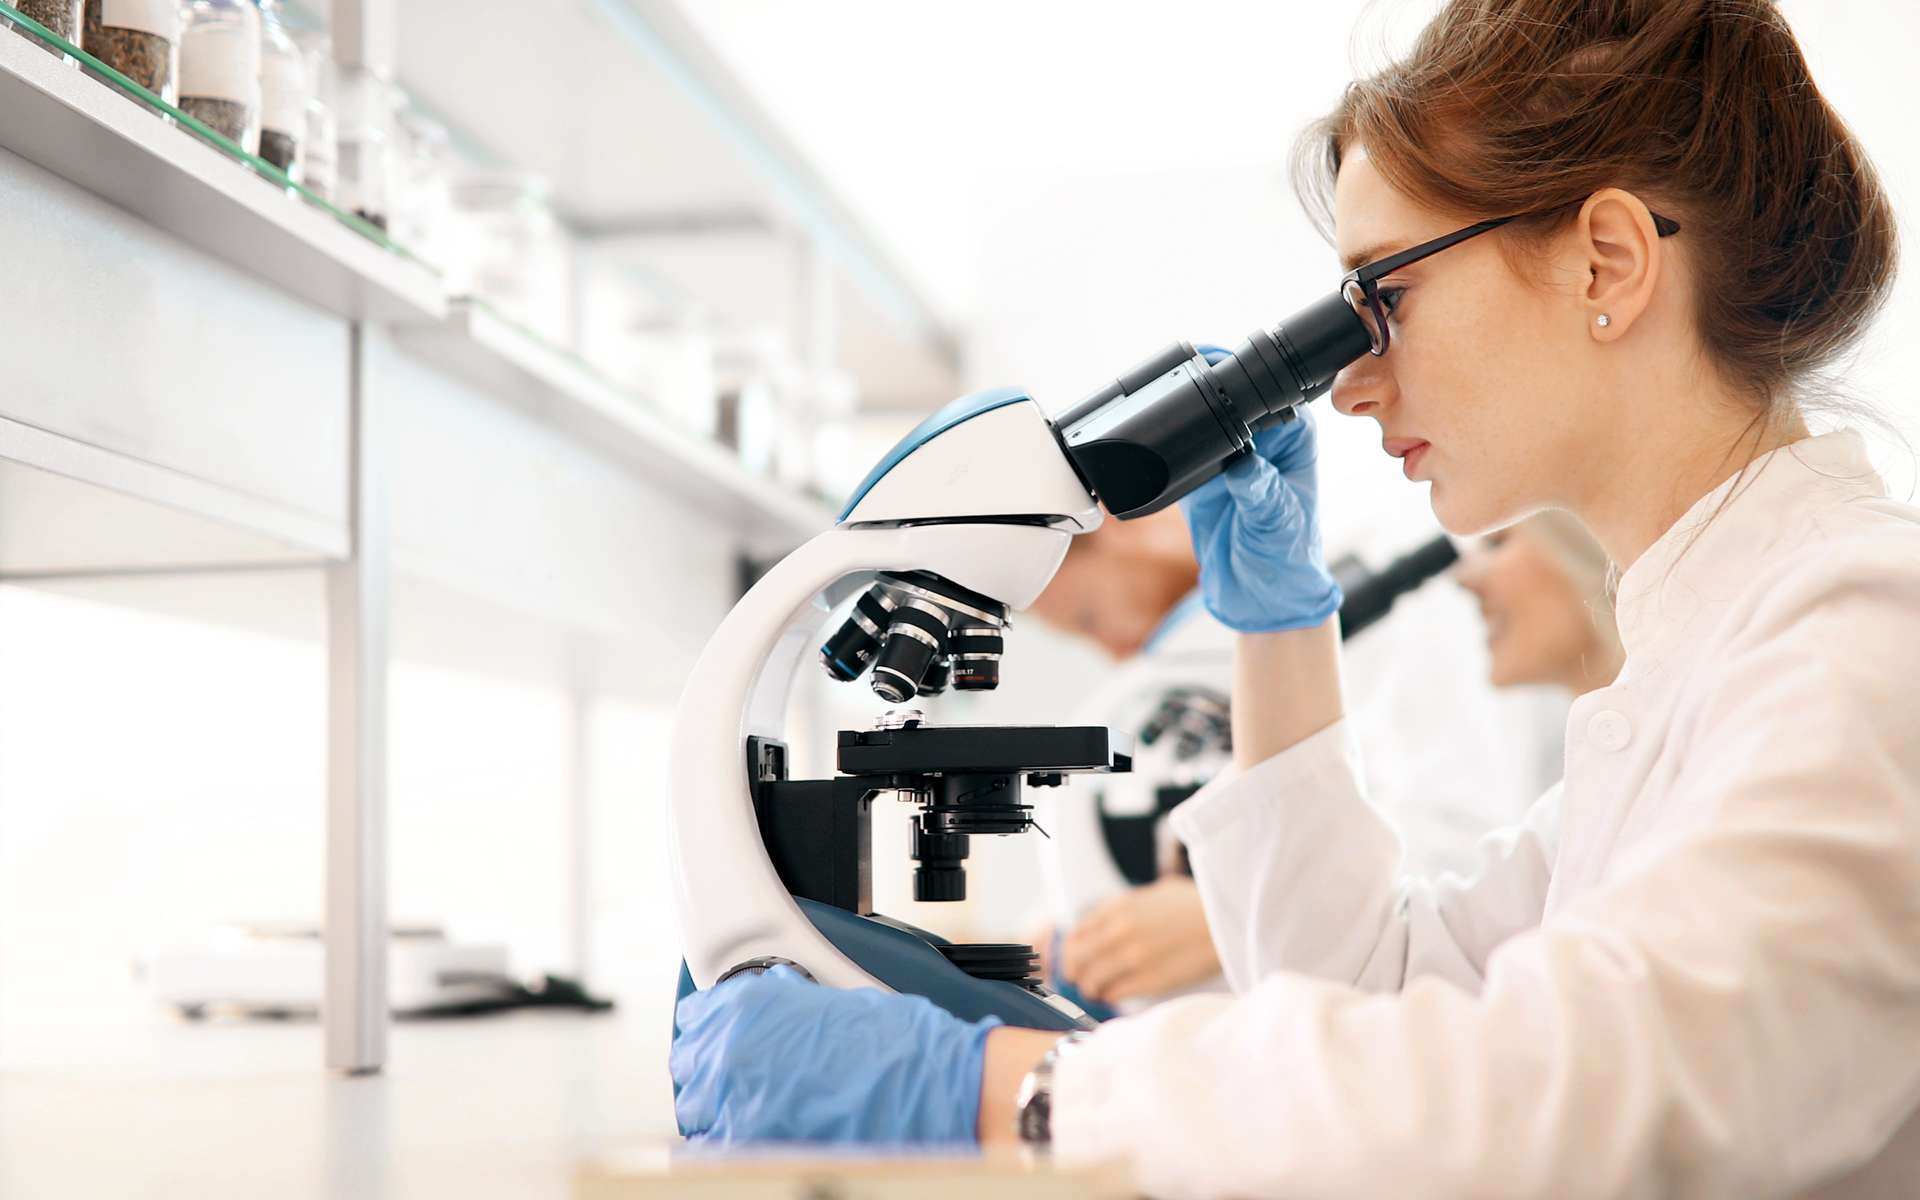 Biochimie humaine : une découverte majeure. © NDABCREATIVITY, Adobe Stock